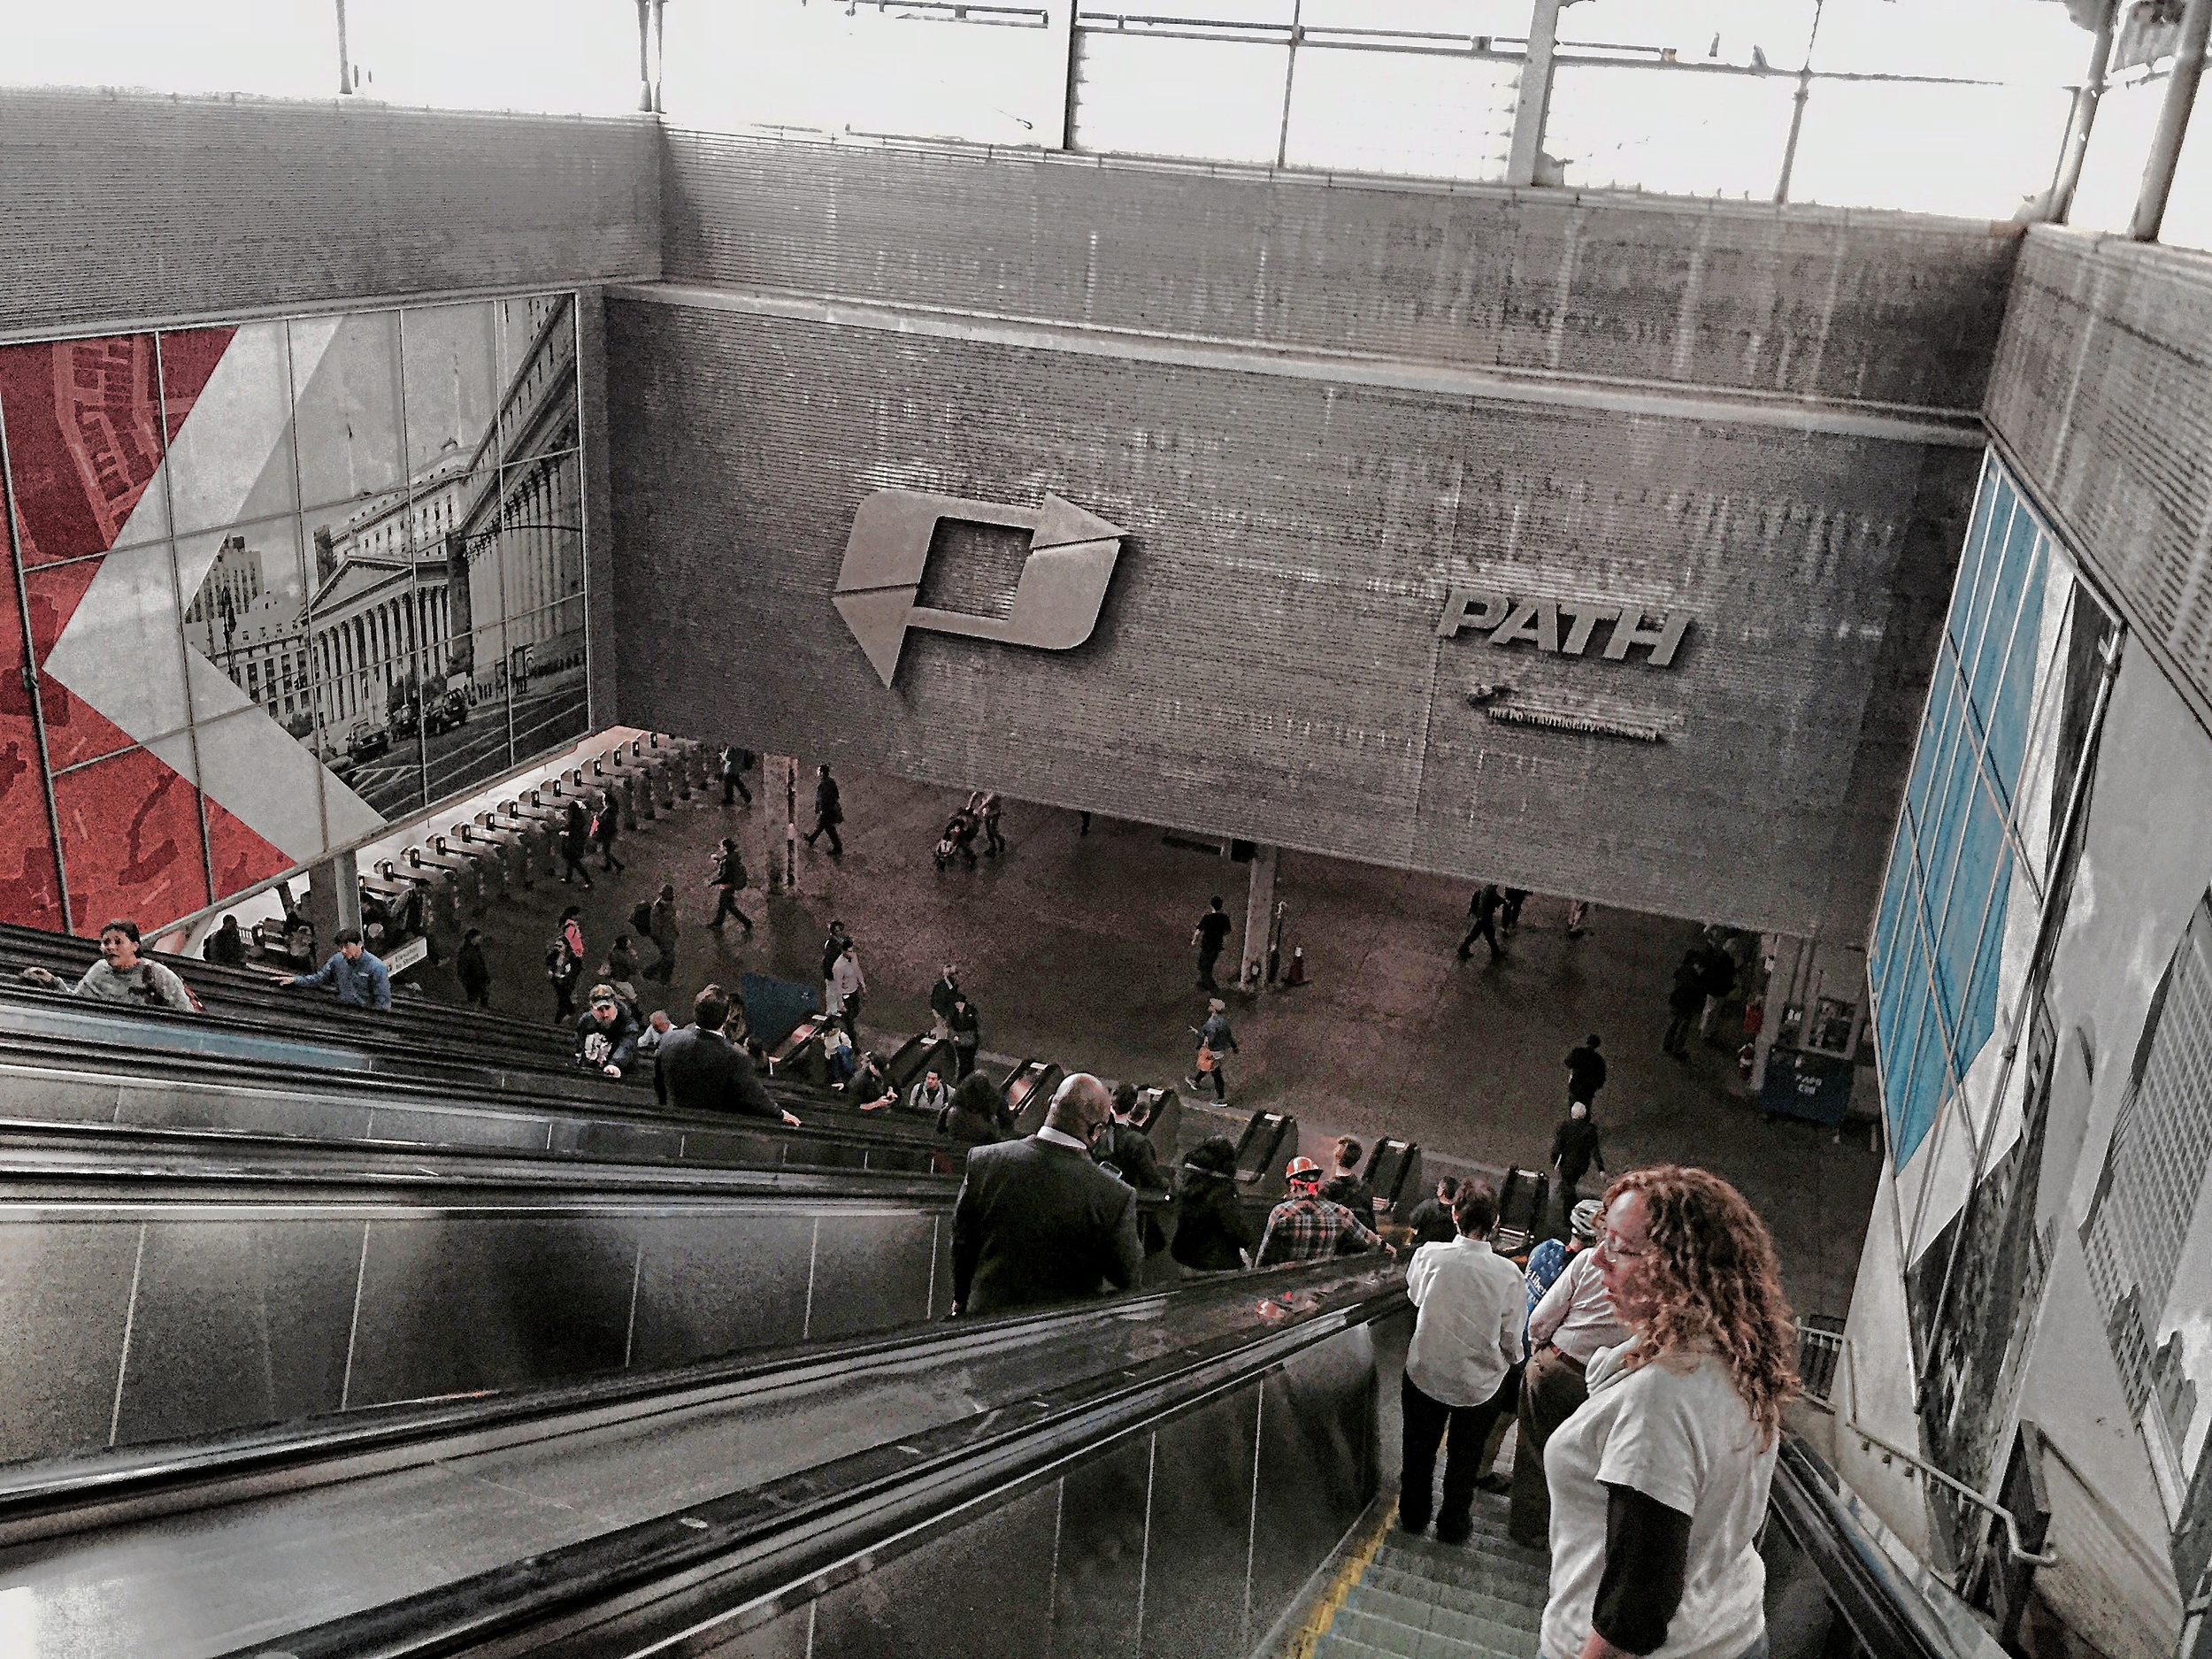 ROCK MAMA NYC LIFESTYLE BLOG -  WORLD TRADE CENTER TRANSPORTATION HUB